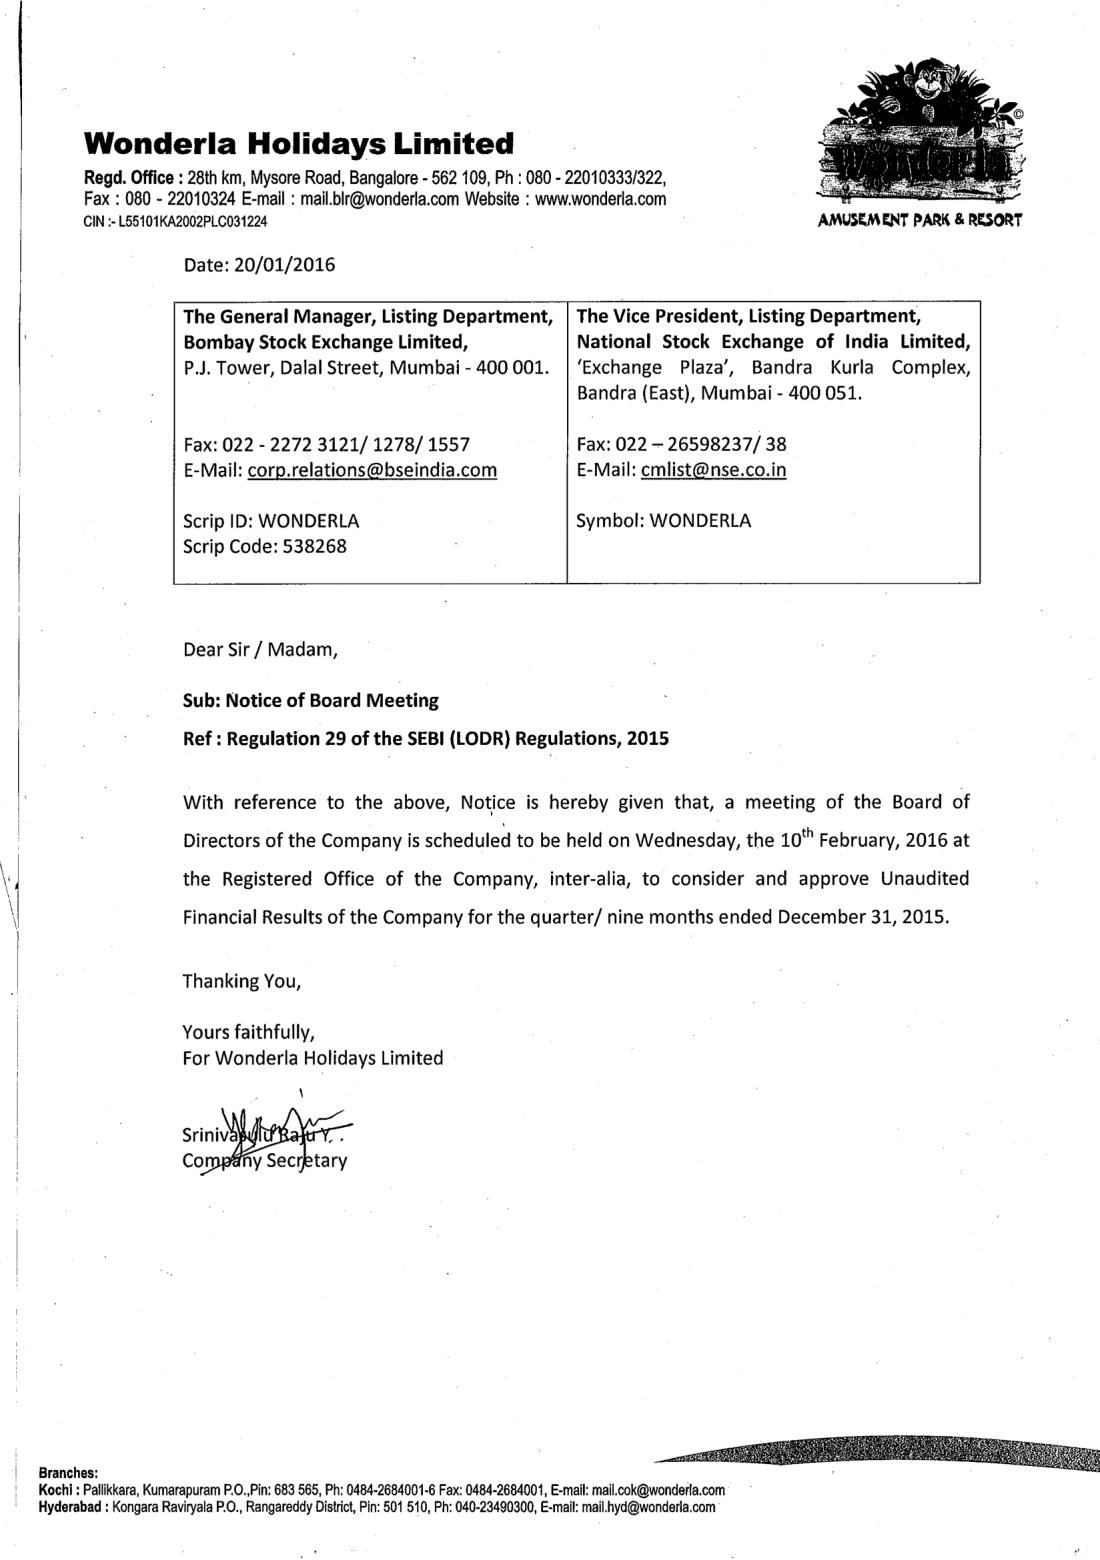 Wonderla Amusement Parks & Resort  BM Notice 31.12.2015-1